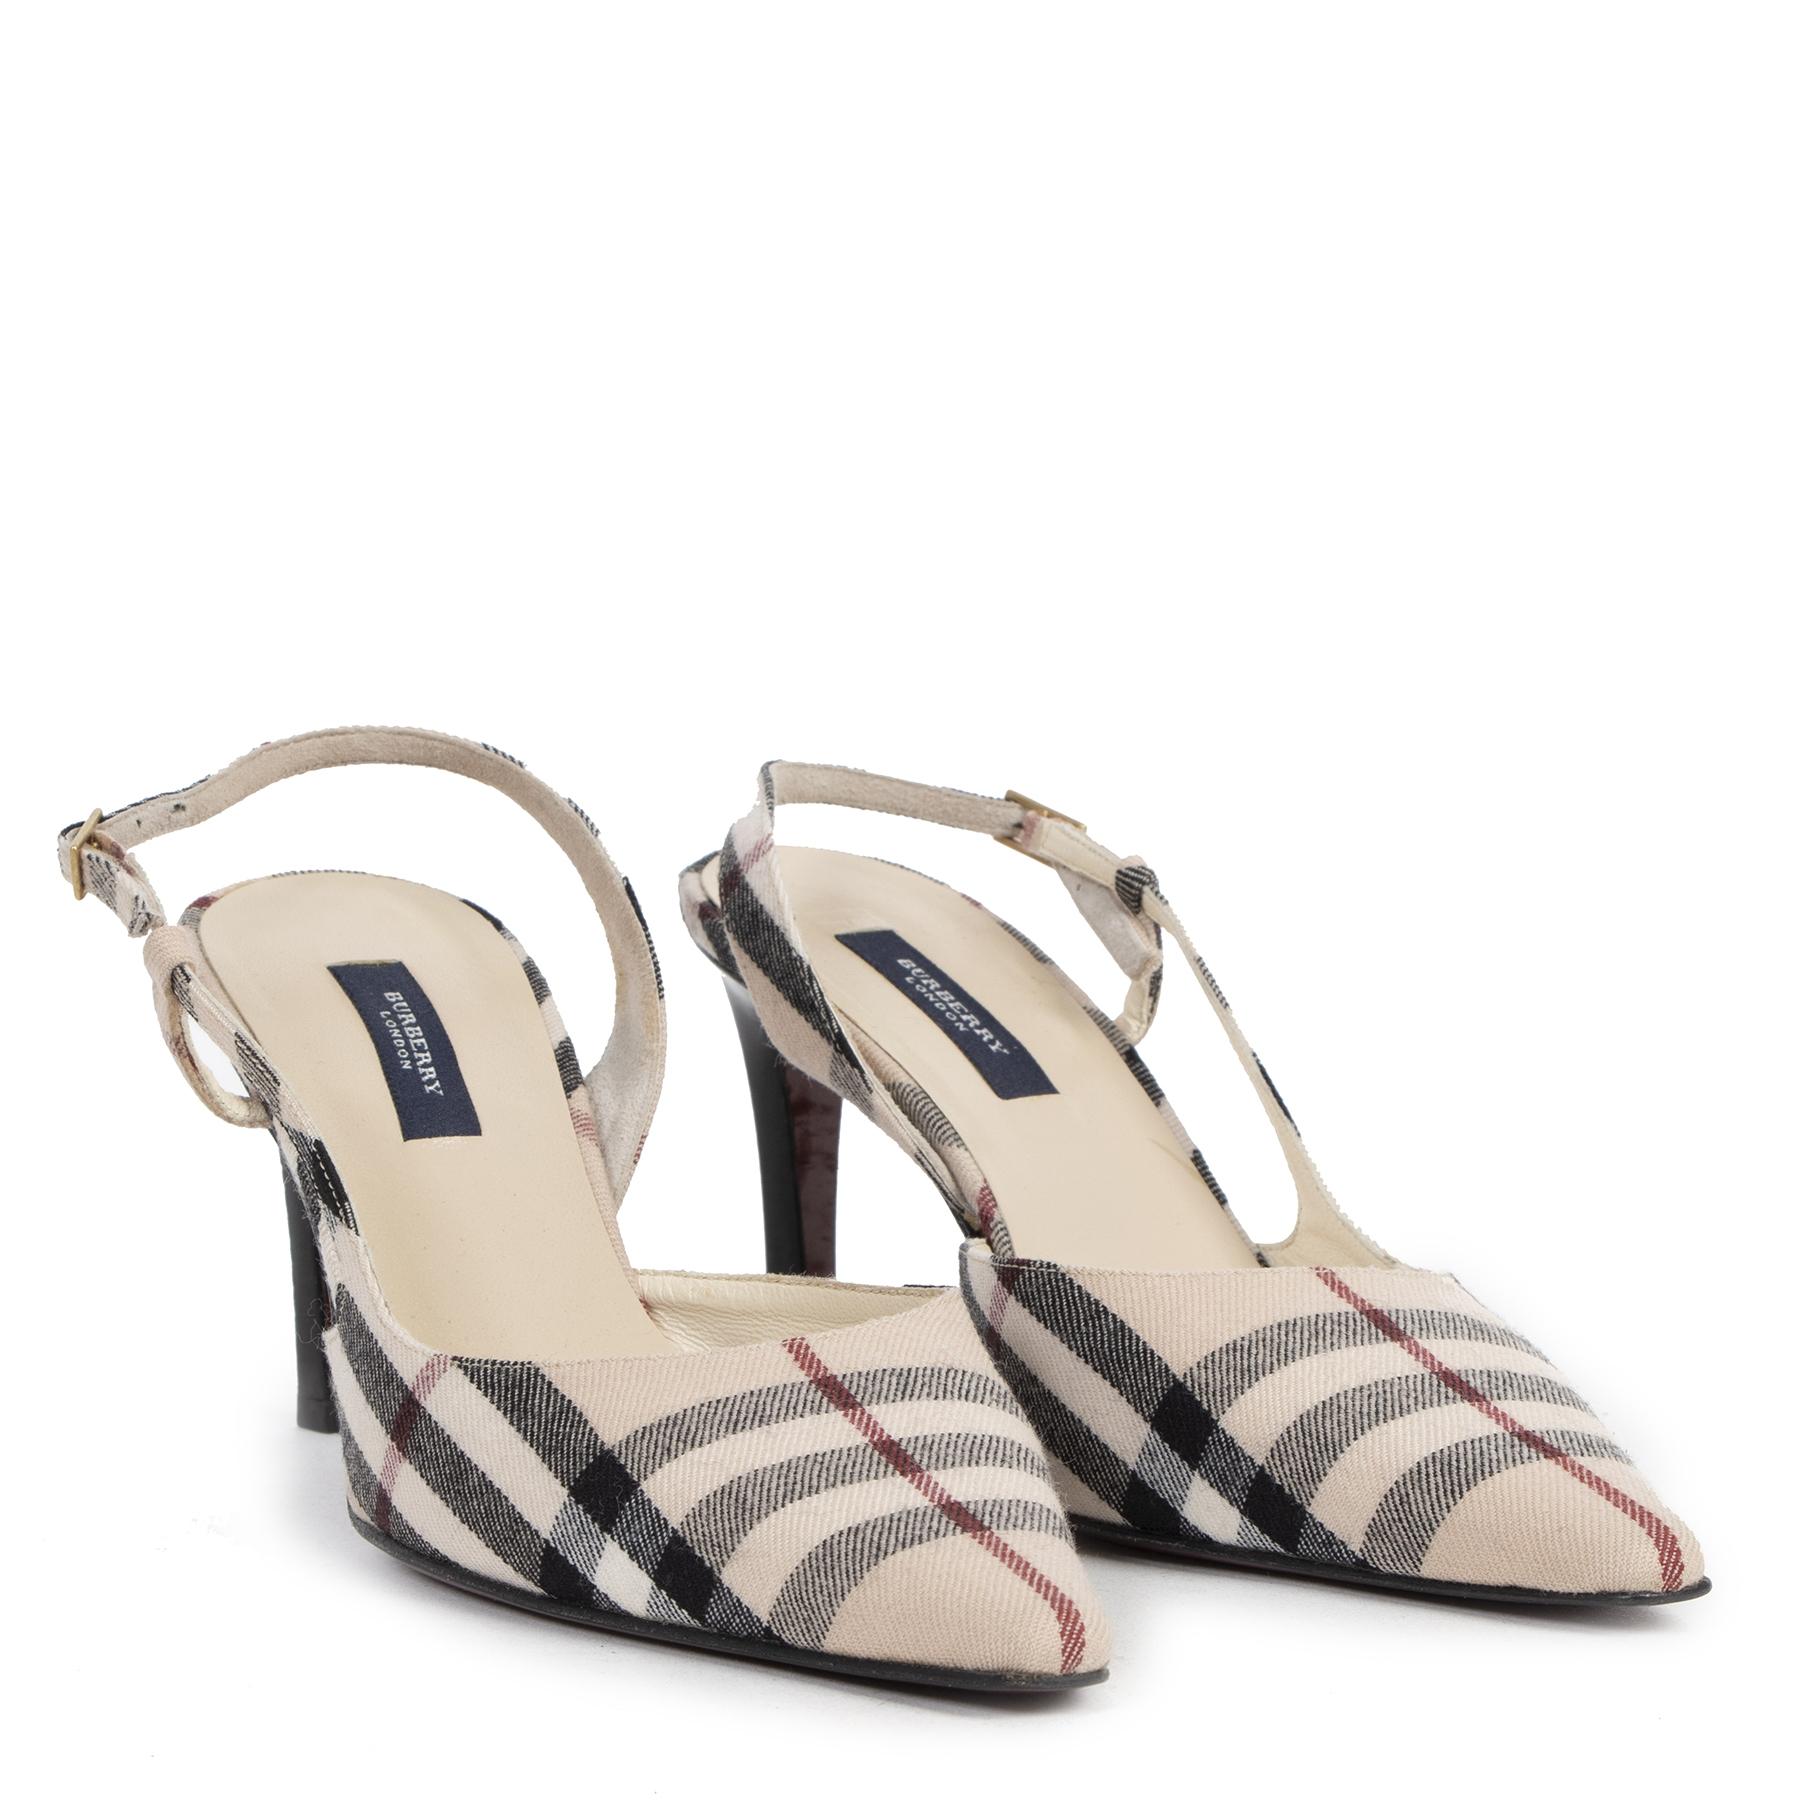 Authentic secondhand Burberry Nova Check Slingback Pumps - Size 39,5 designer shoes high heels luxury vintage webshop fashion safe secure online shopping